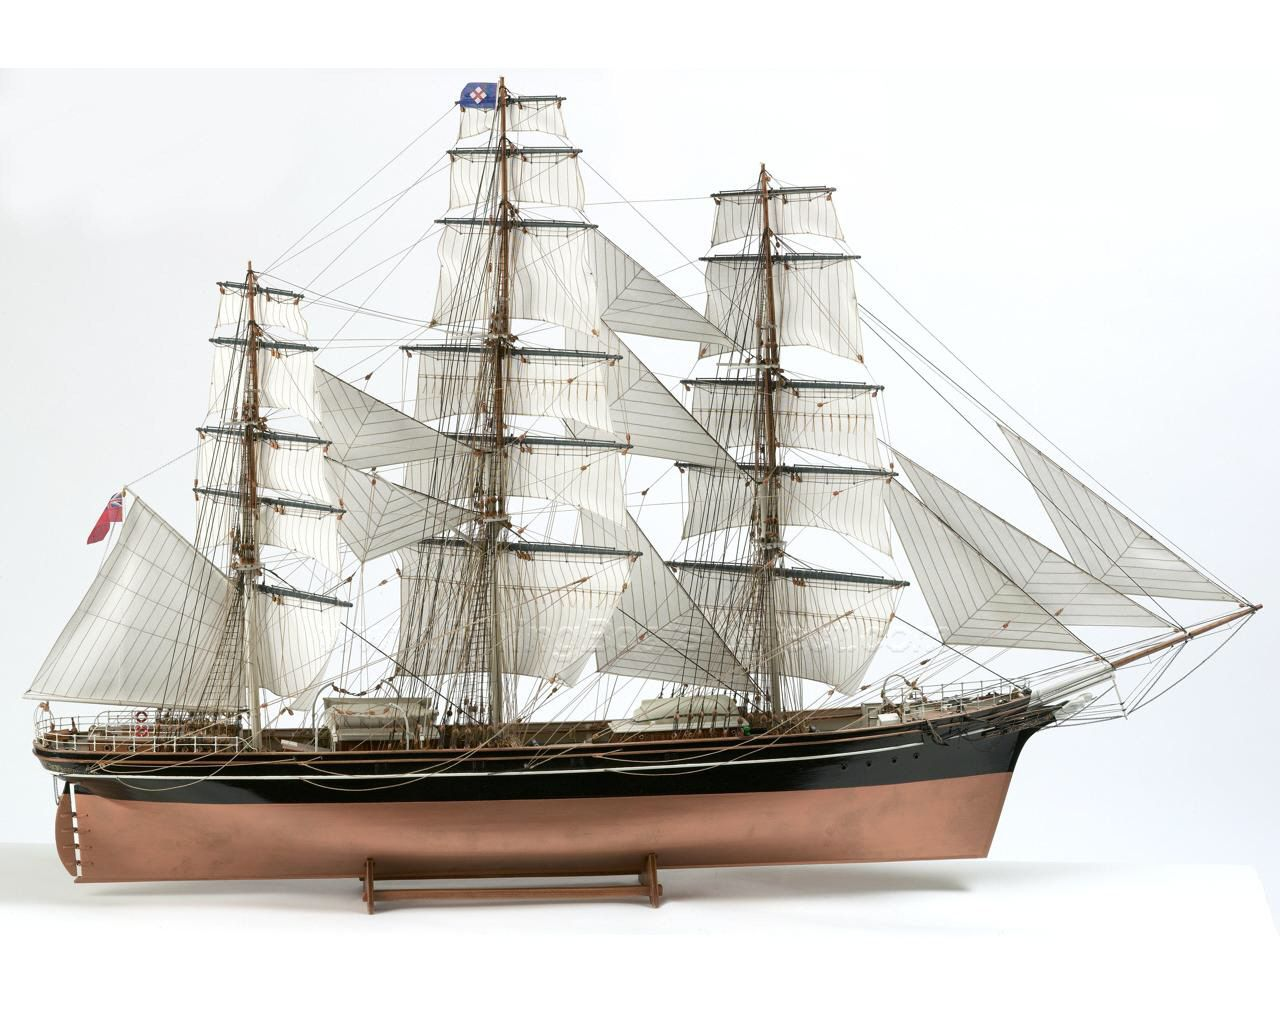 Billing Boats (B564) Cutty Sark Sailing Clipper Ship - Model